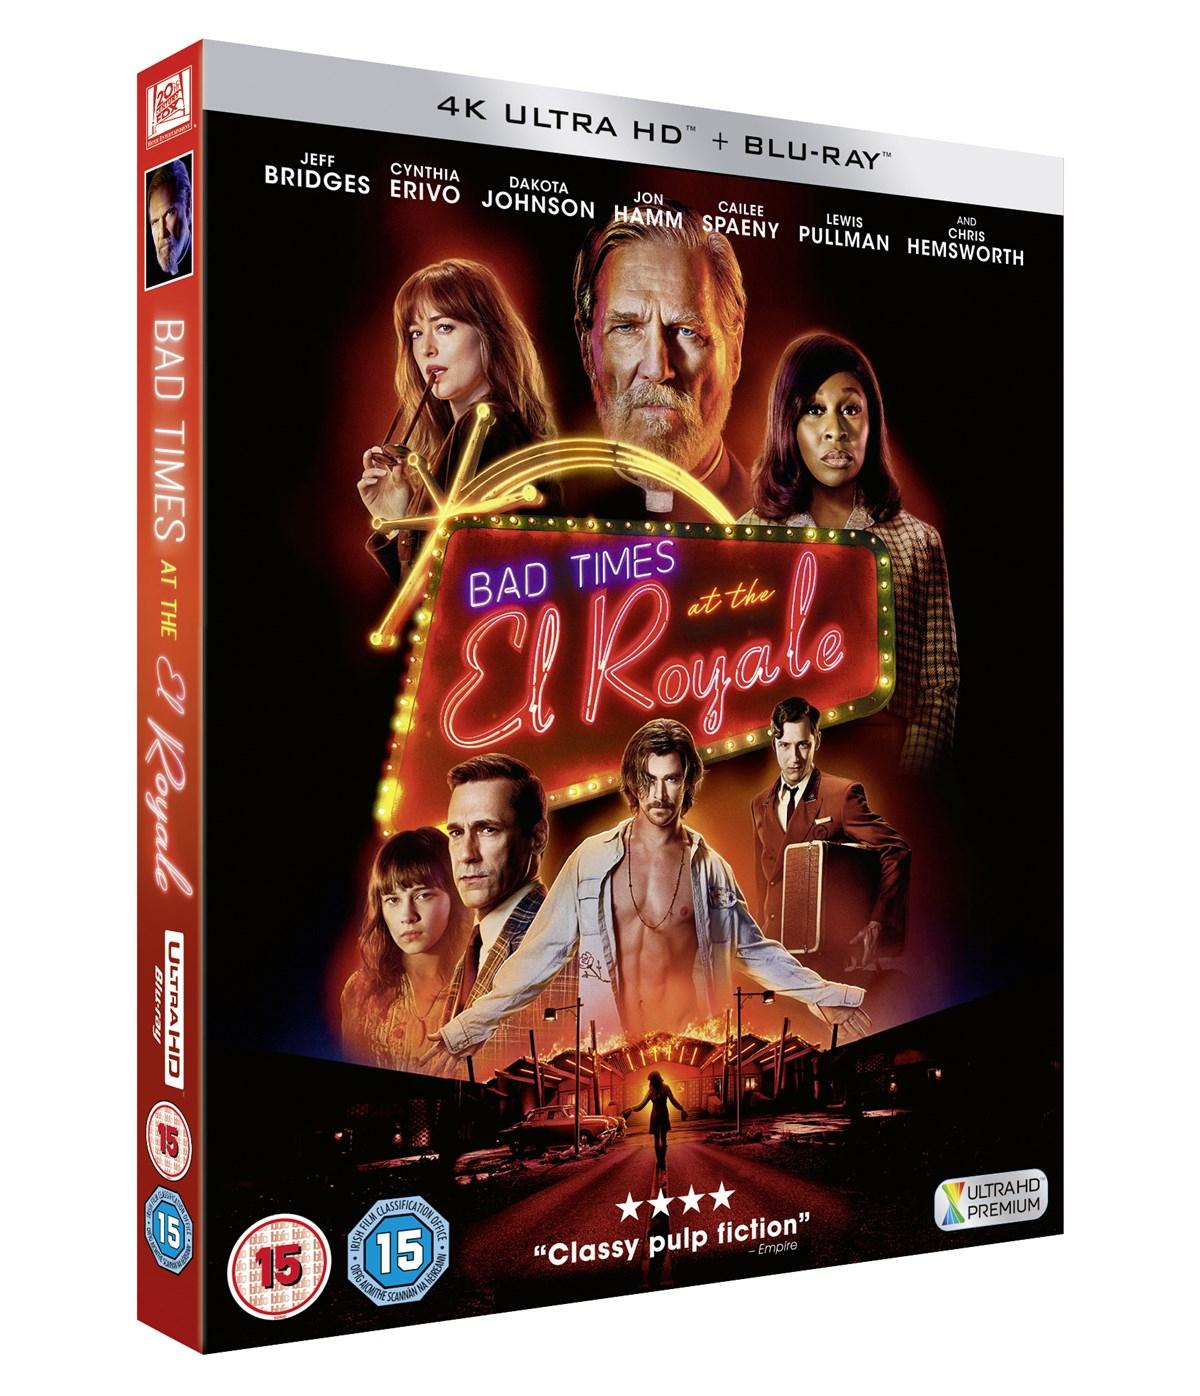 Bad Times at the El Royale (4K Blu-ray + Blu-ray) für 13,30€ inkl. Versand (Zoom & Amazon UK)